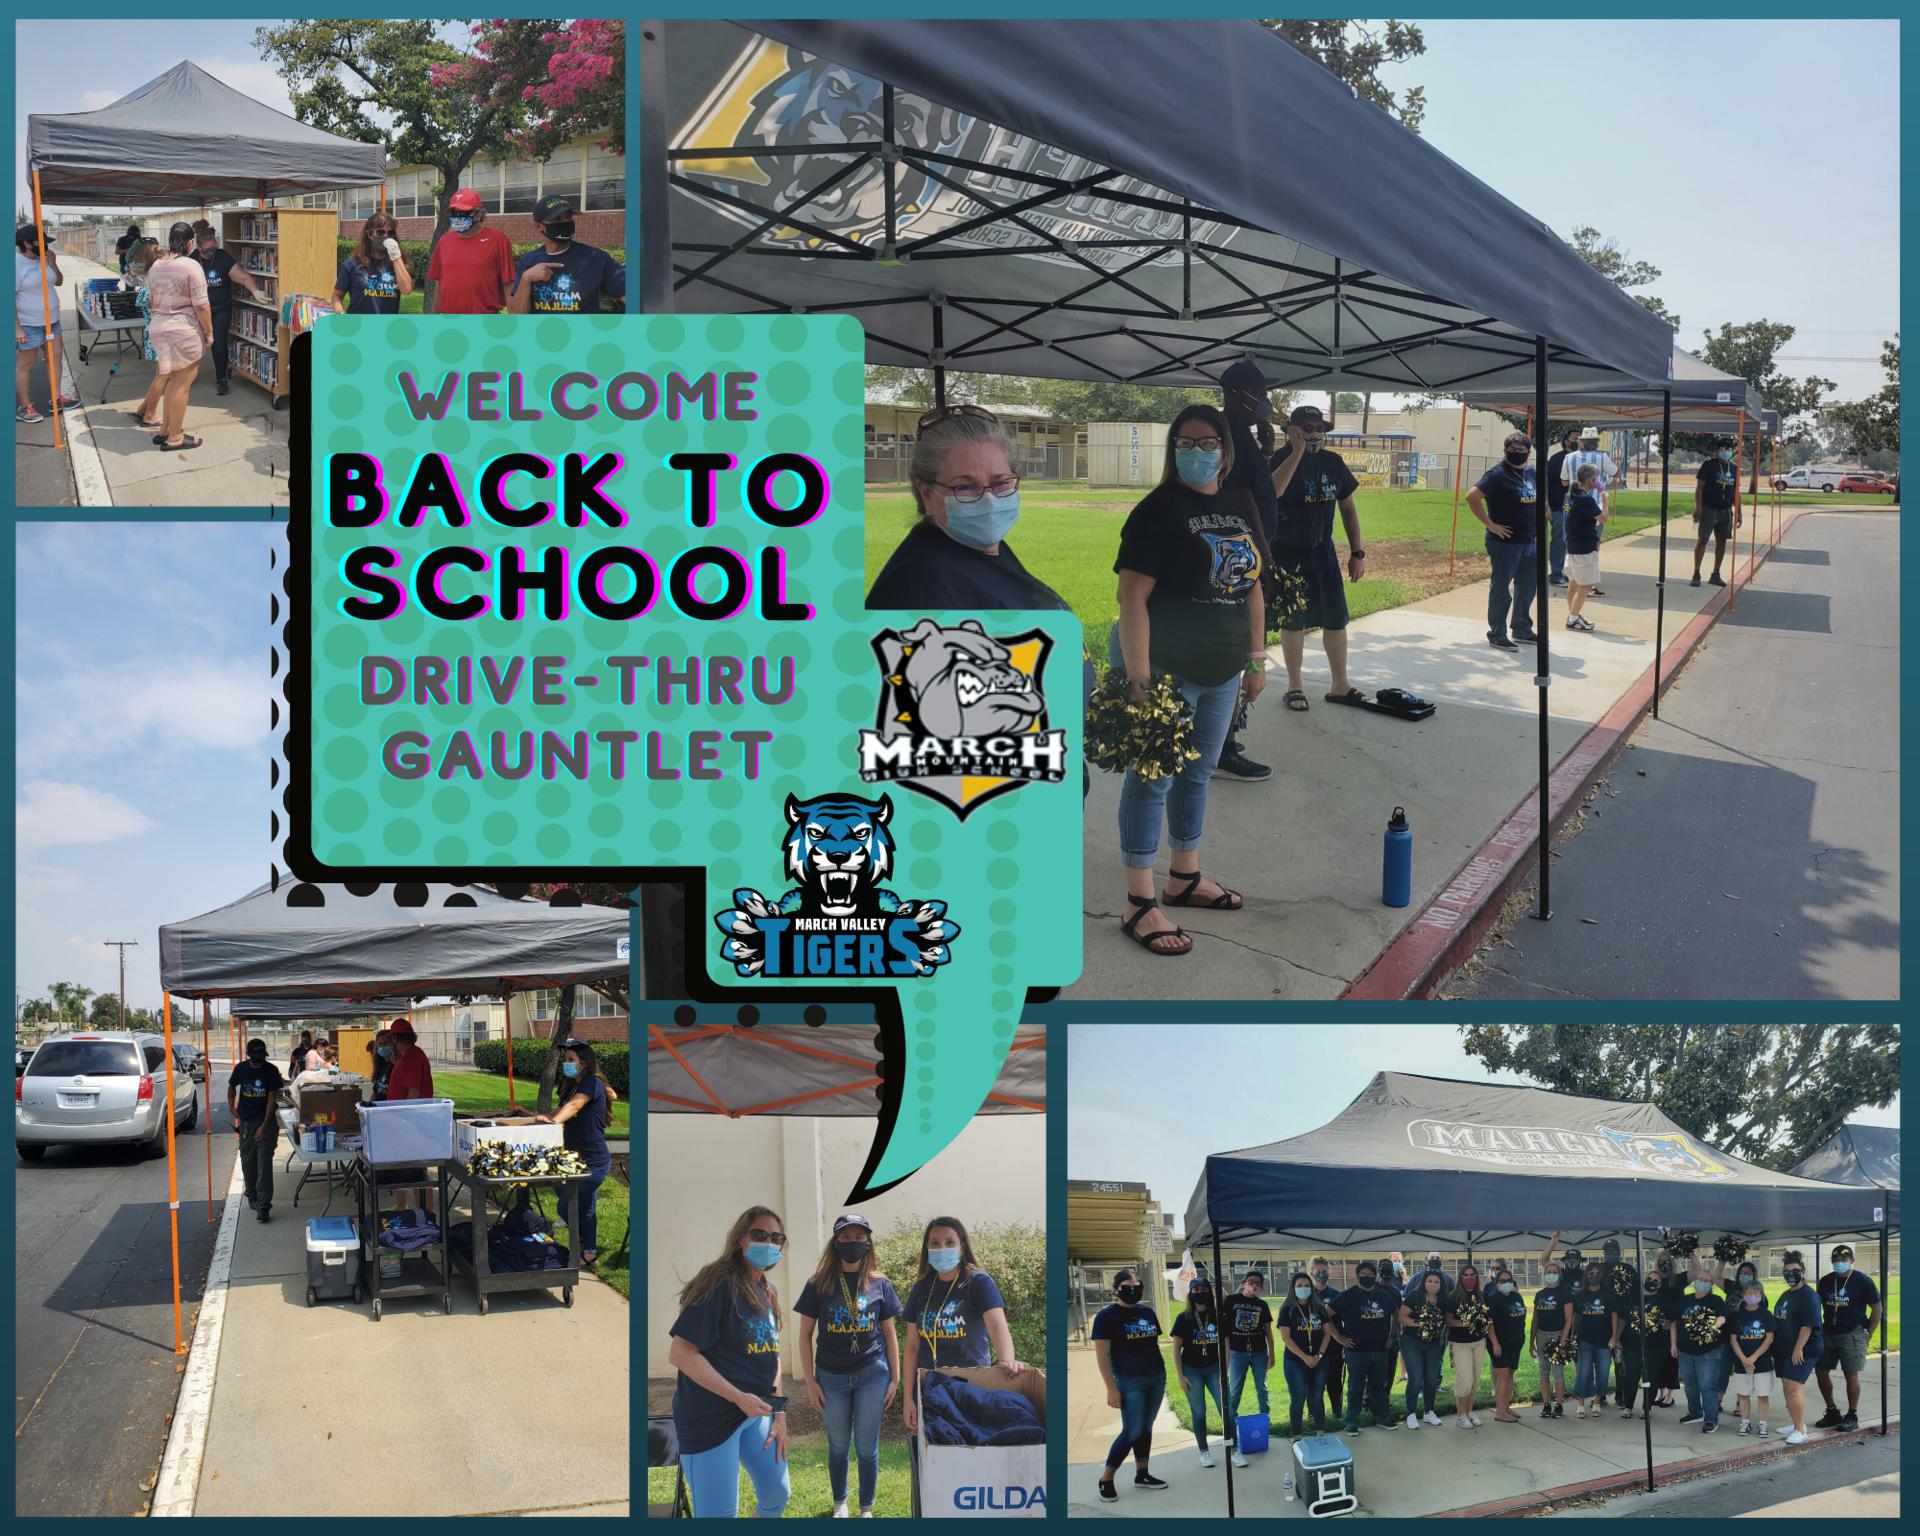 Team MARCH: Back to School Gauntlet